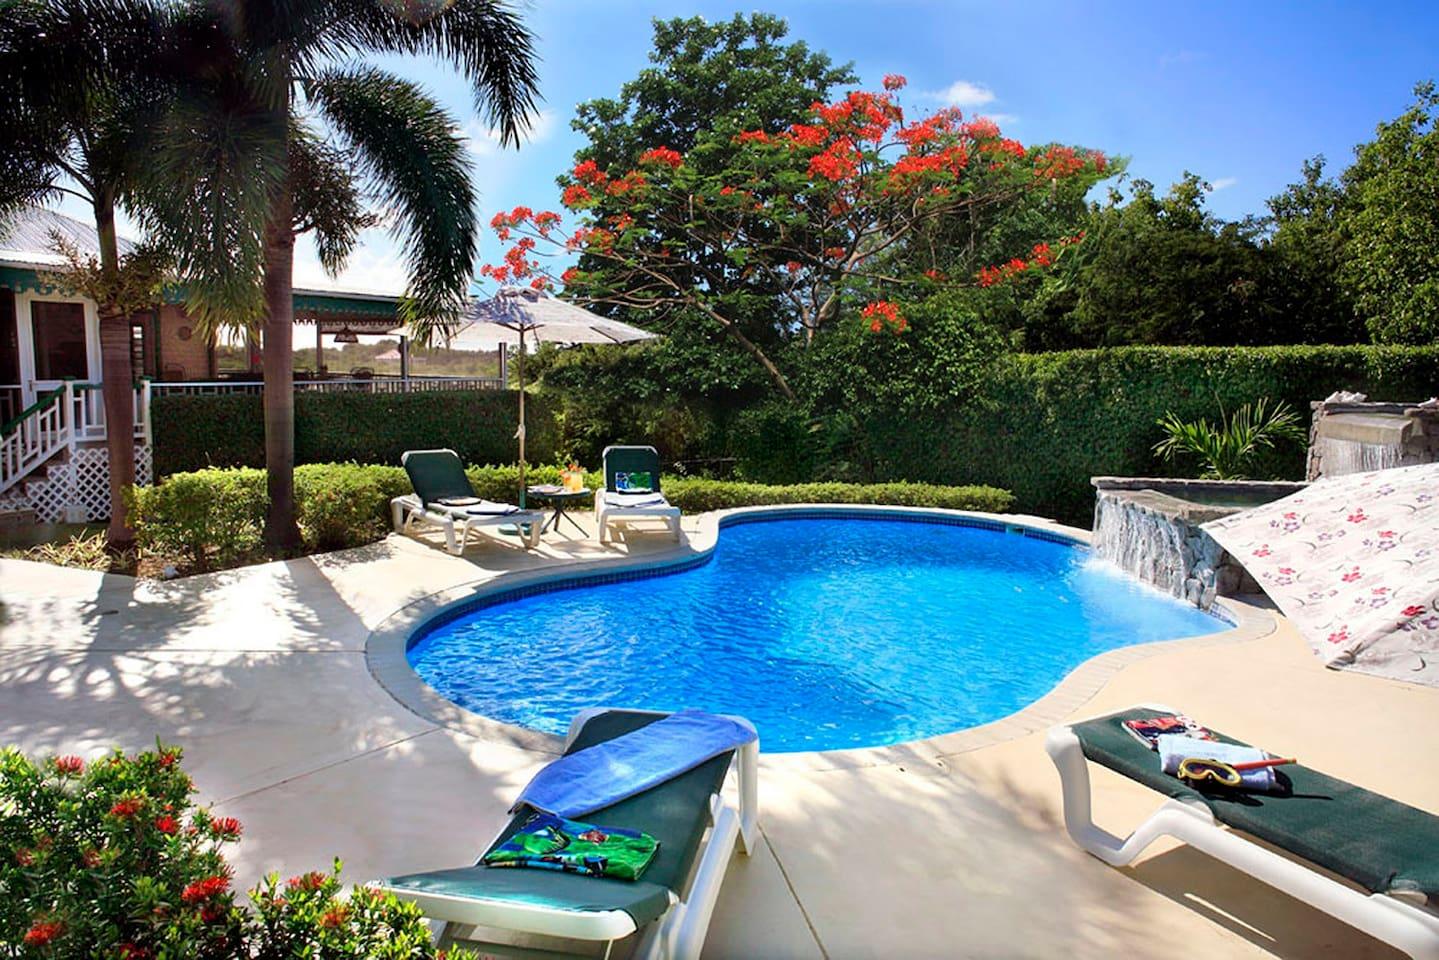 Villa Verandah private pool and waterfall.